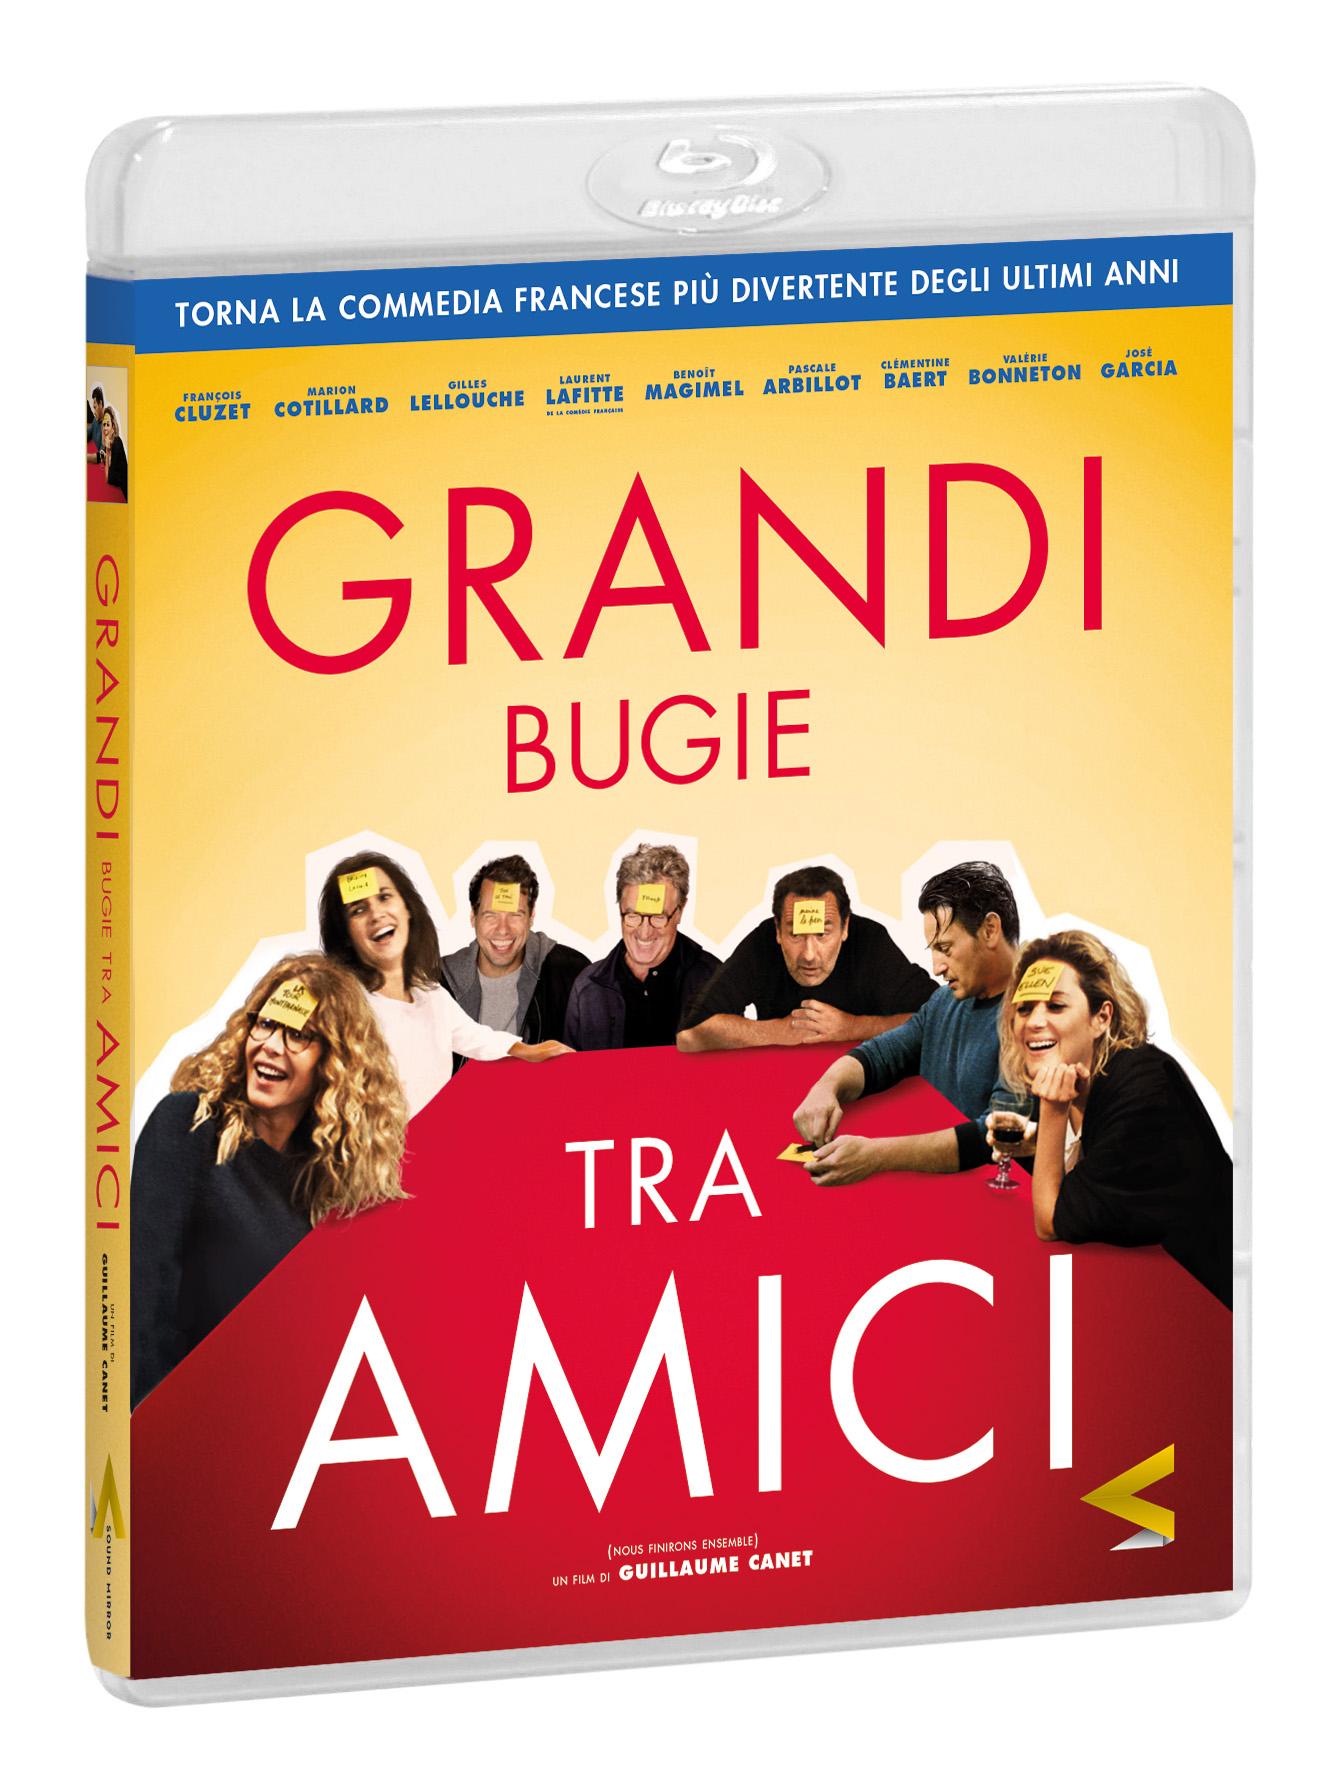 GRANDI BUGIE TRA AMICI - BLU RAY